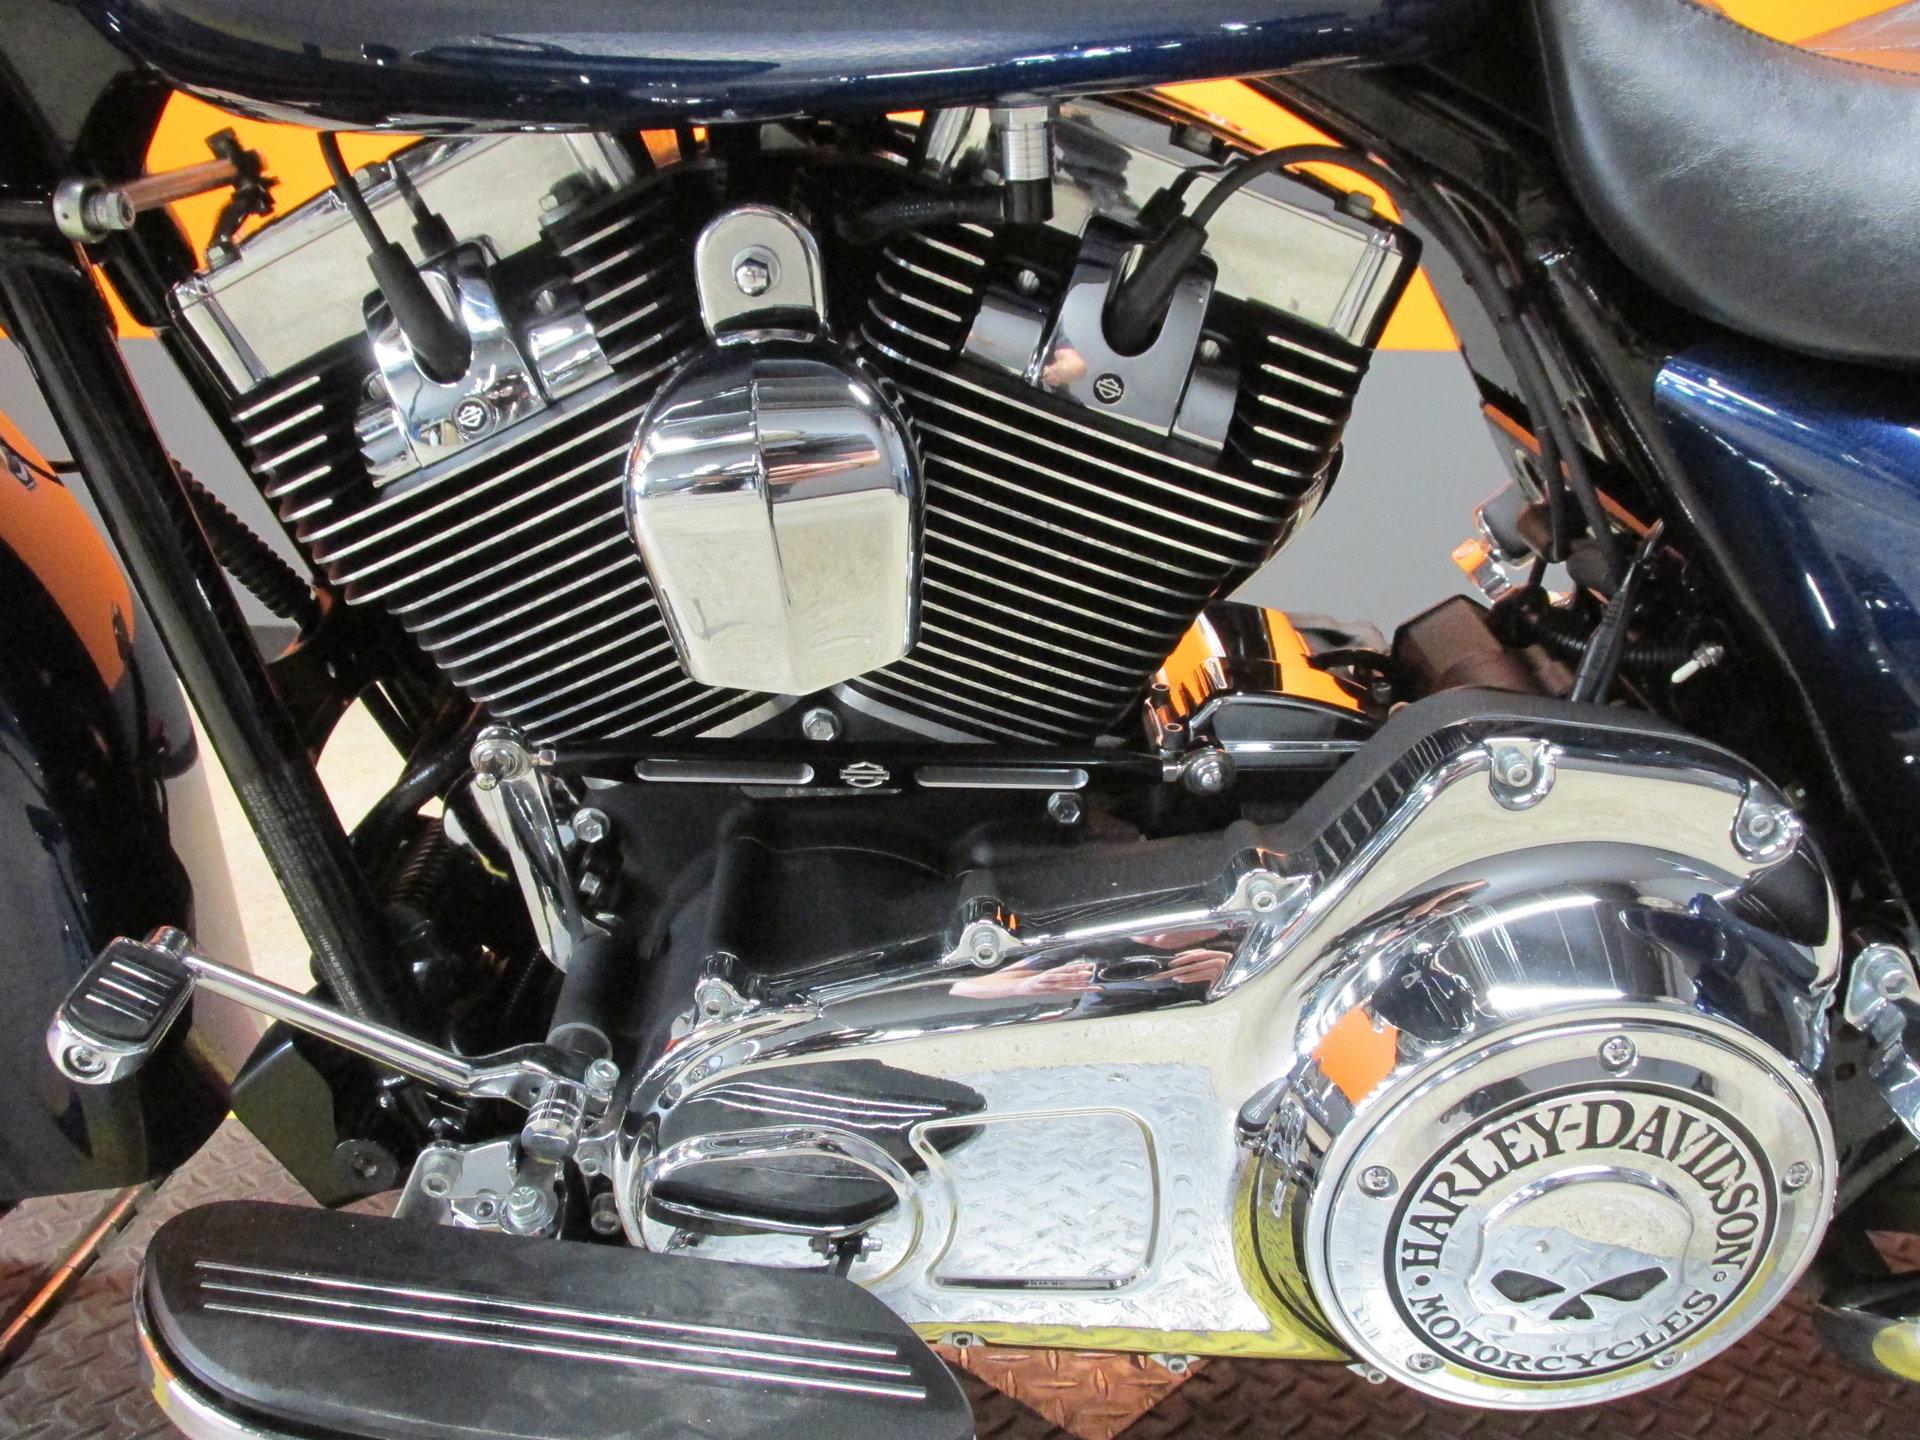 2012 Harley Davidson Street Glide Berlin Motors For Sale